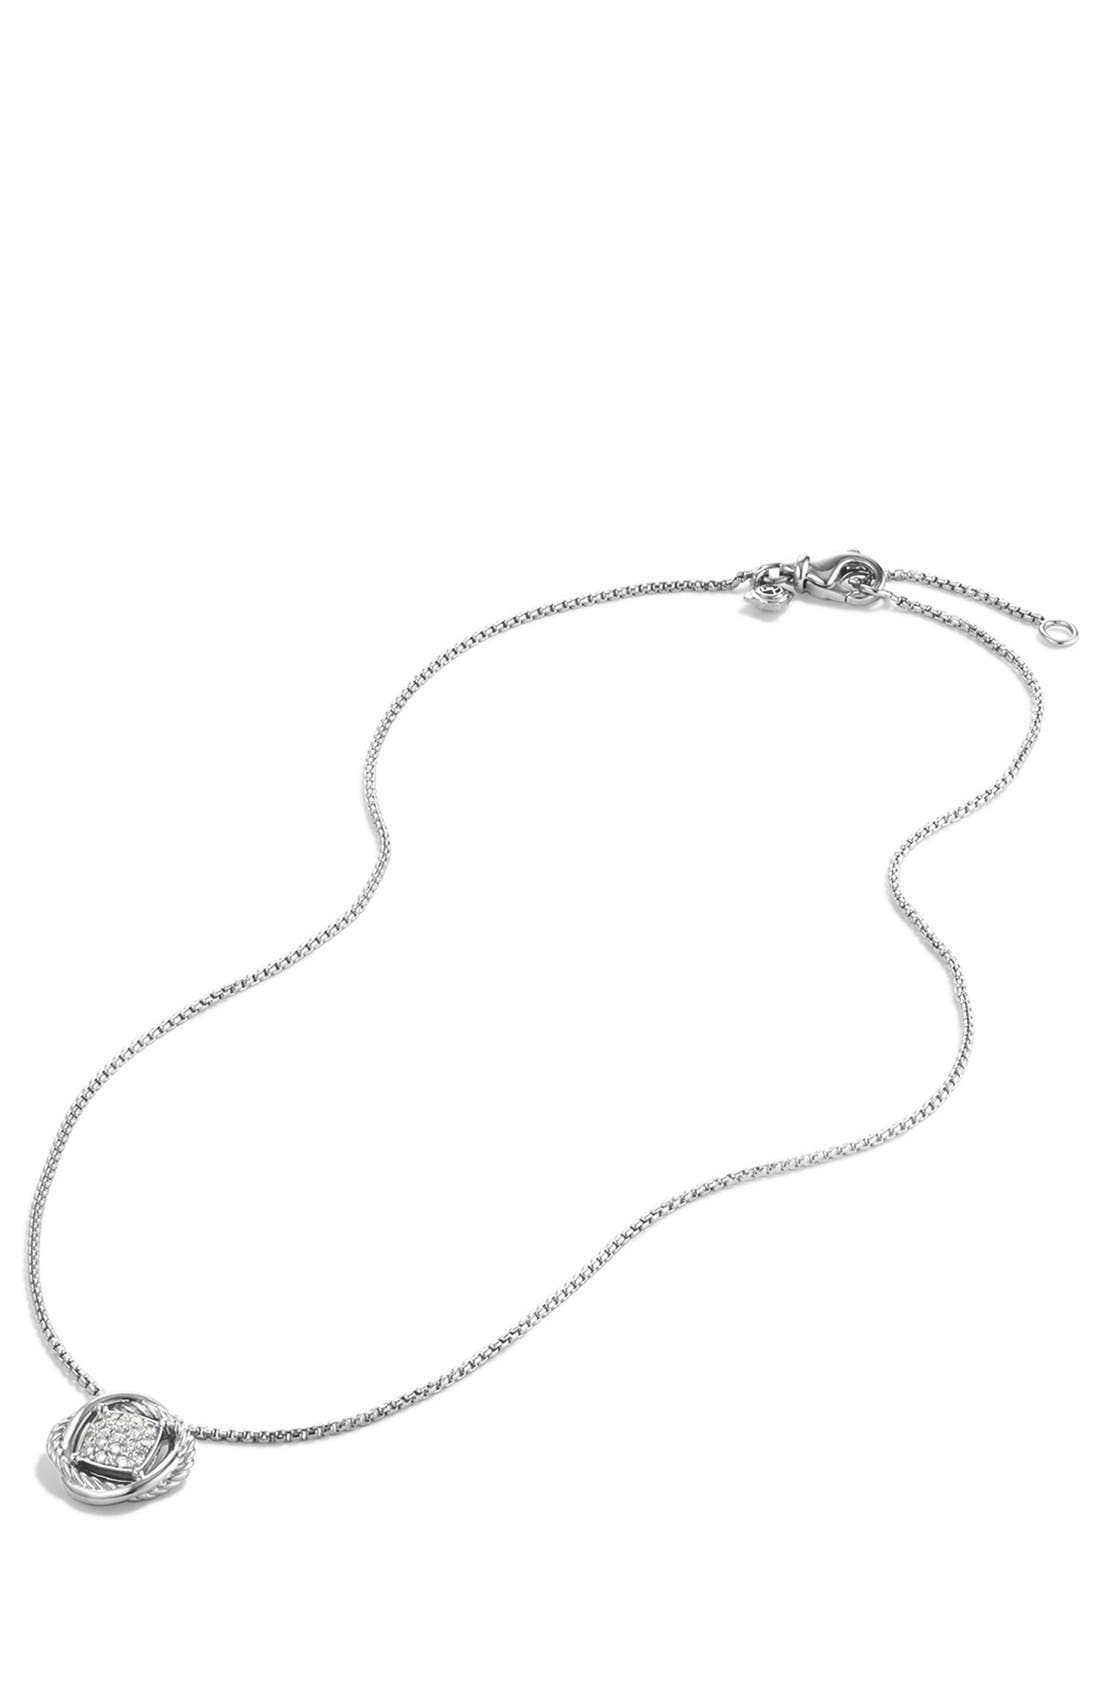 Alternate Image 2  - David Yurman 'Infinity' Pendant with Diamonds on Chain